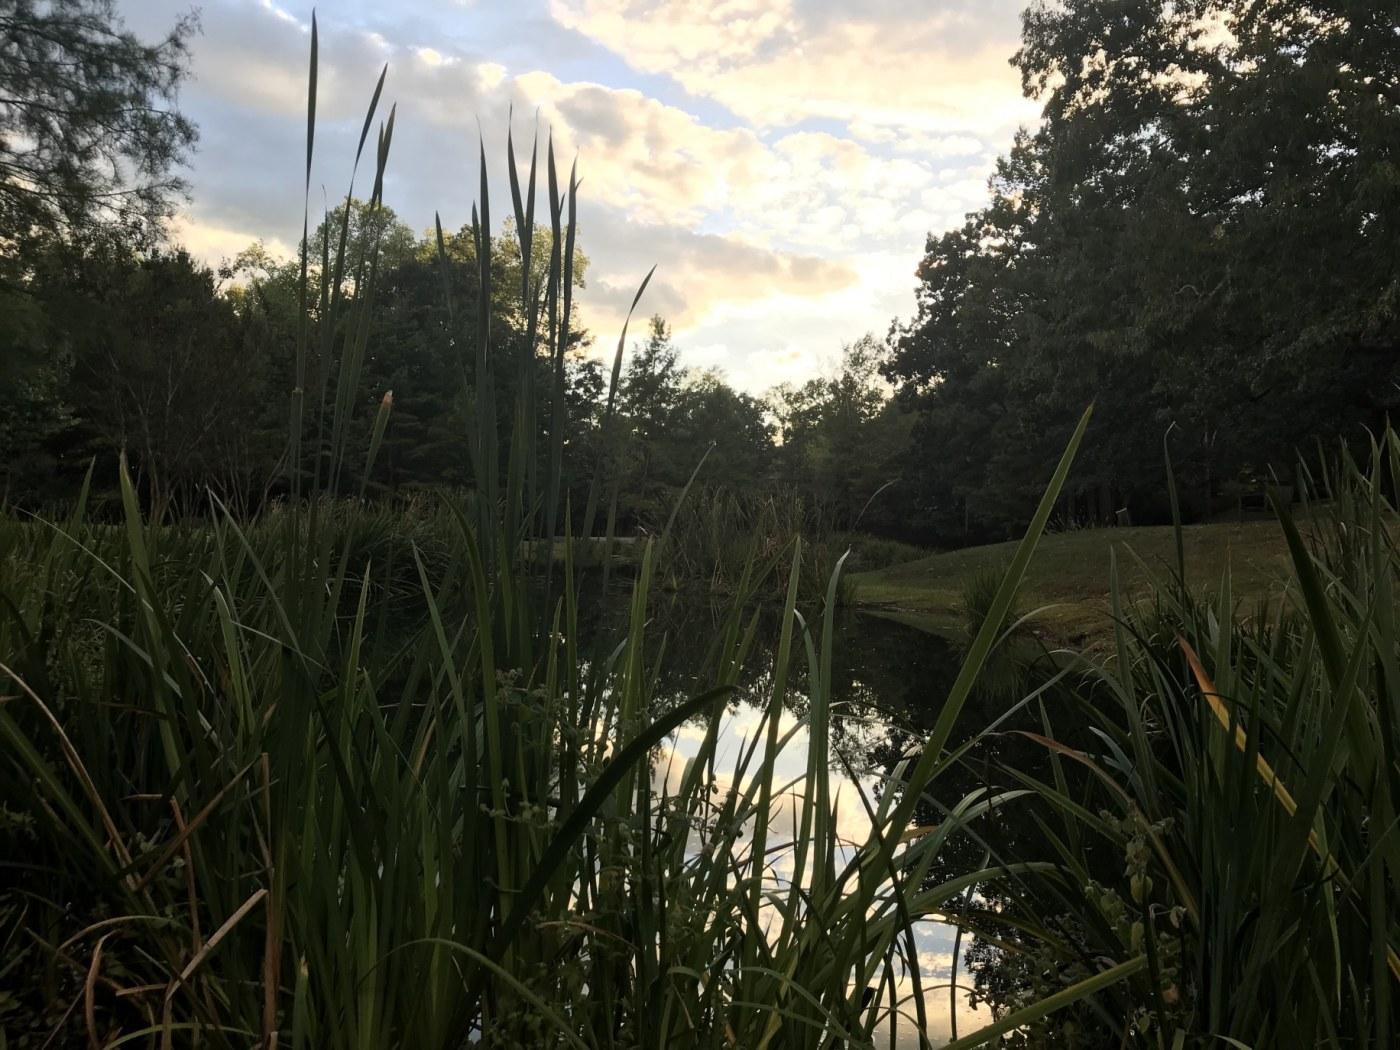 Birmingham, Alabama, original SPC campus, Samford University, pond